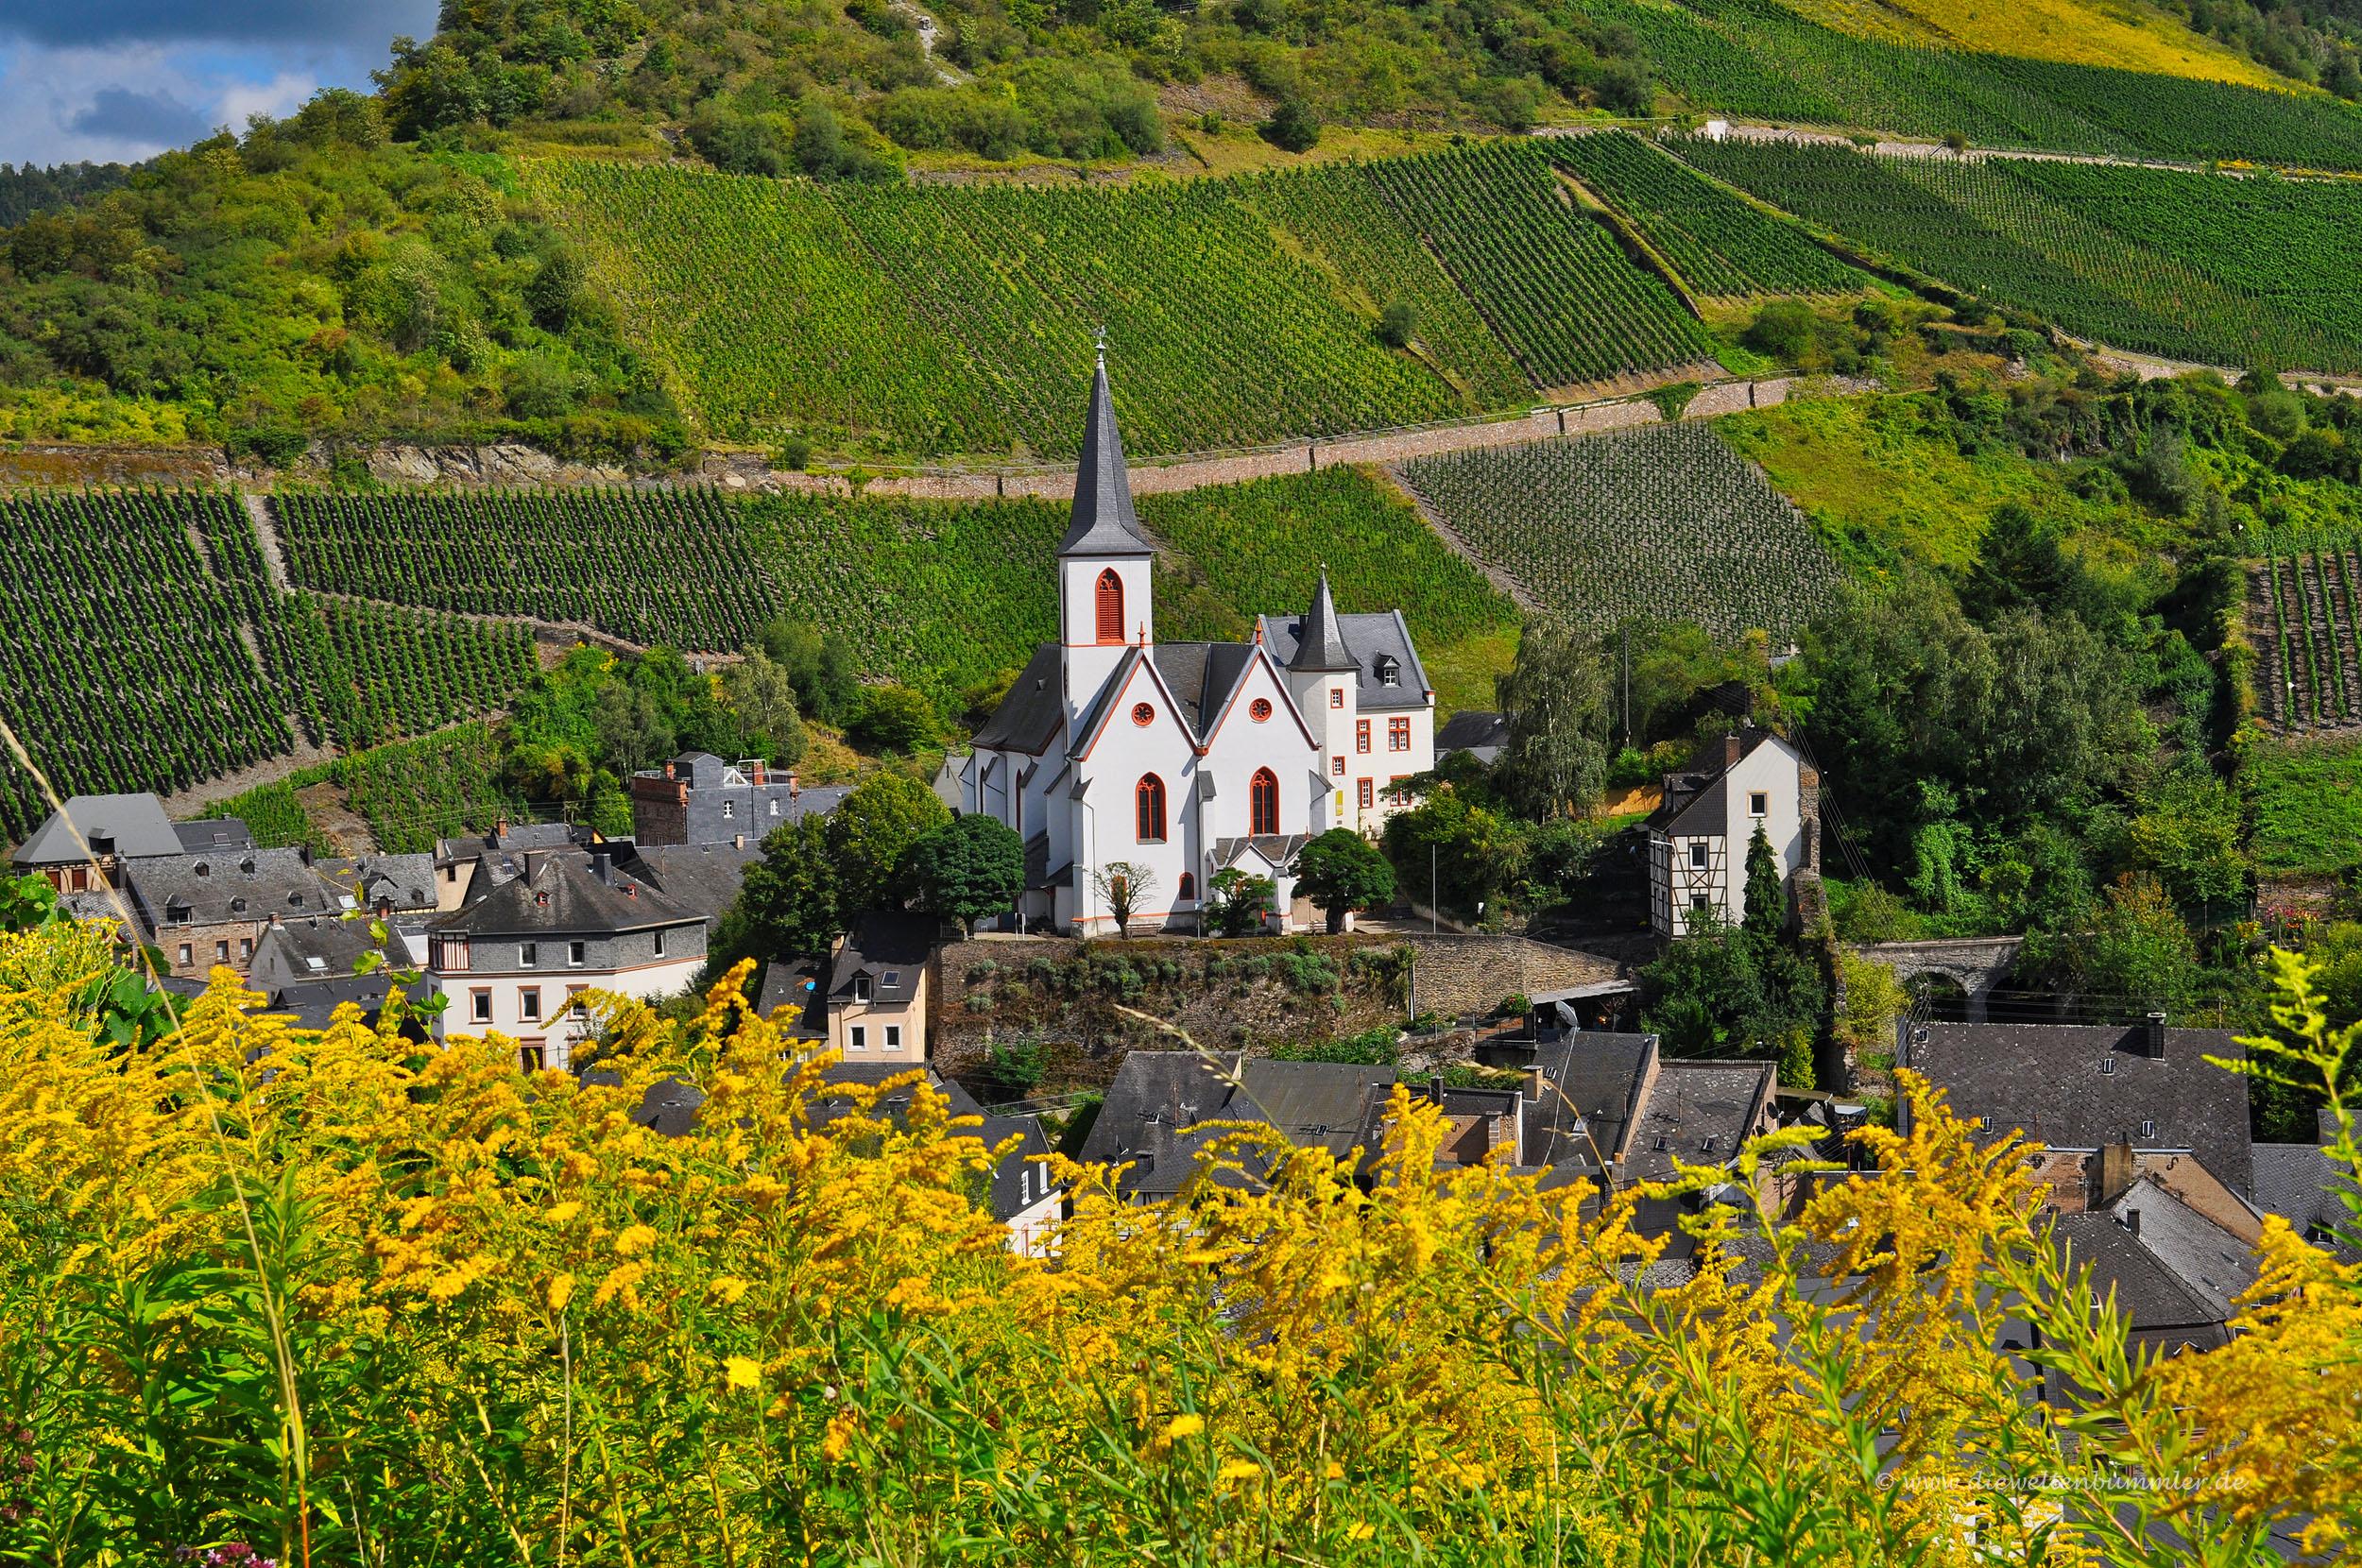 Kirche in Traben-Trarbach